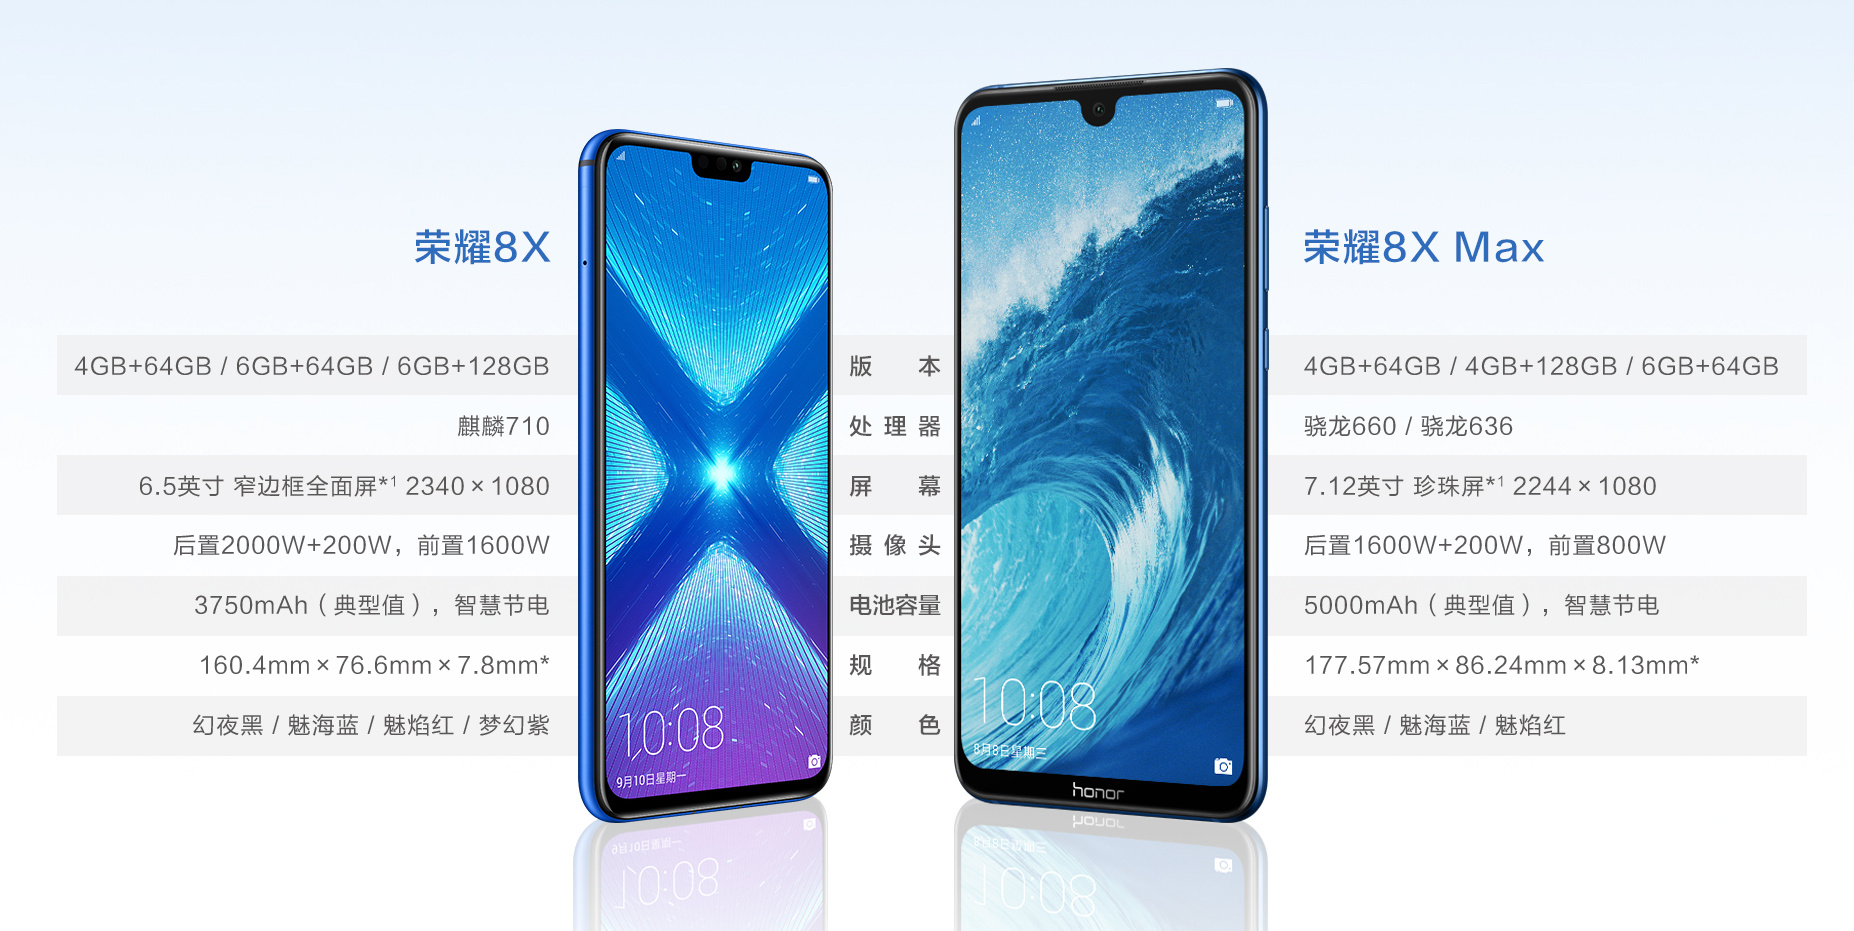 Honor 8x - شركة أونور تعلن رسمياً عن الجوالين Honor 8X و Honor 8X Max مع شاشات ضخمة